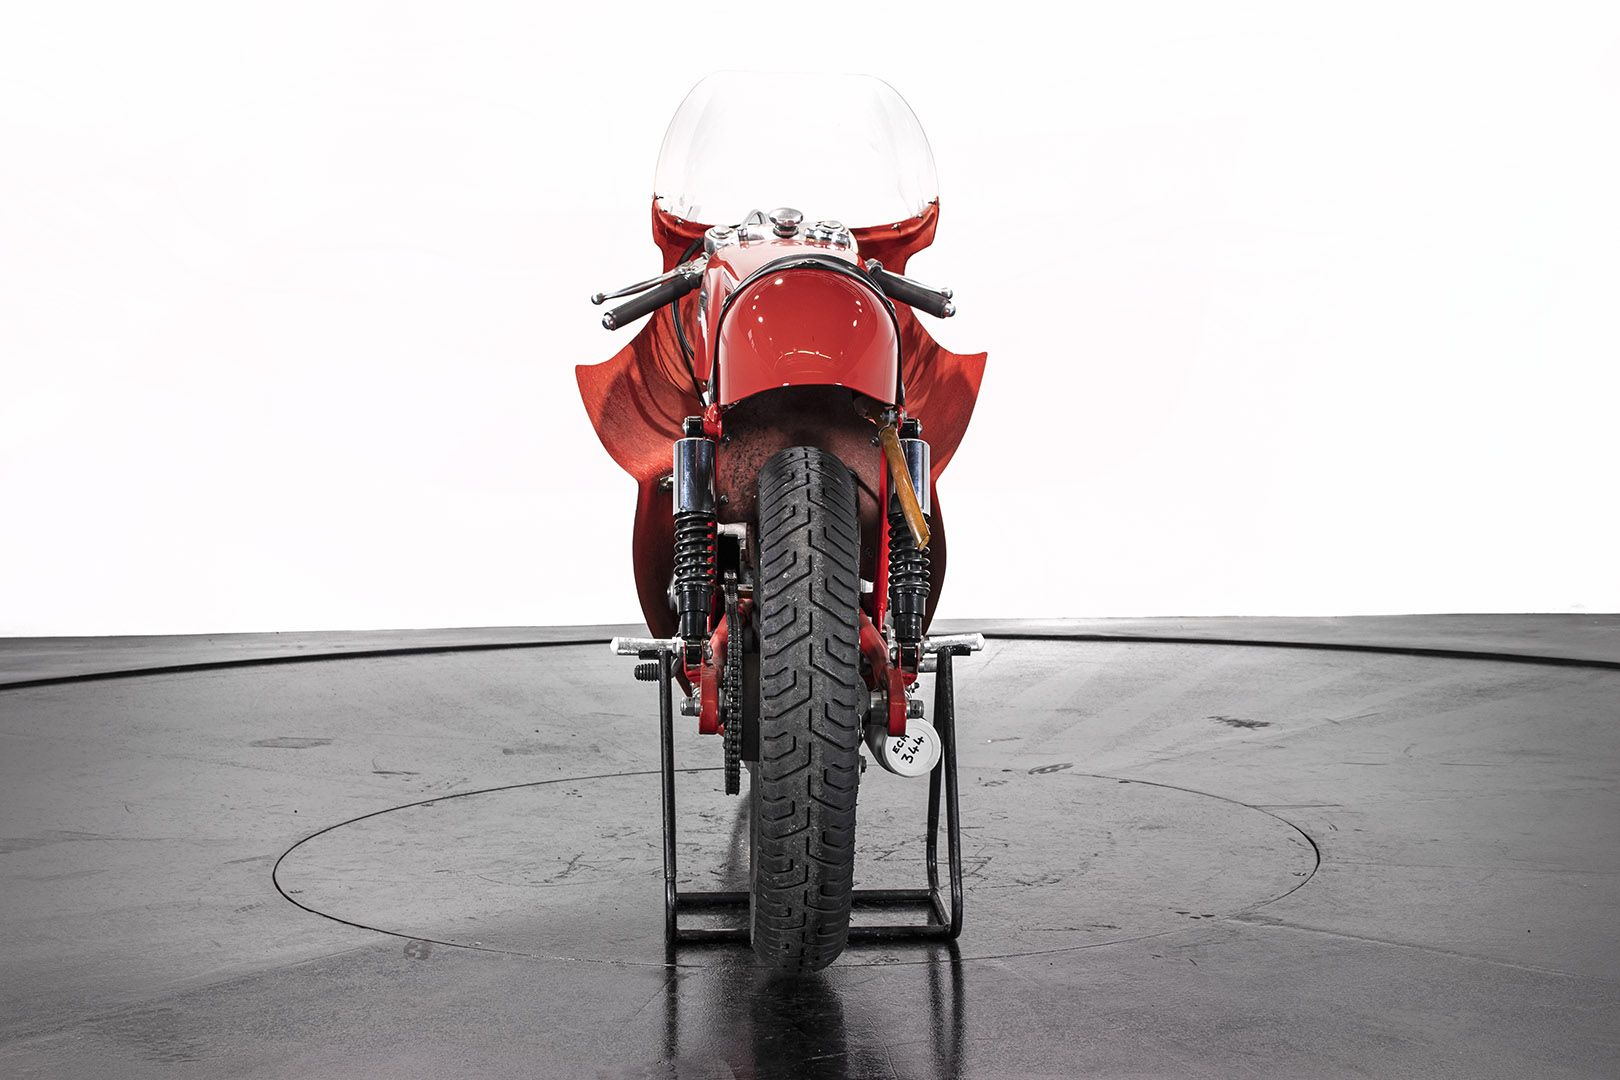 1969 Aermacchi Harley-Davidson 350 Ala d'oro 61114